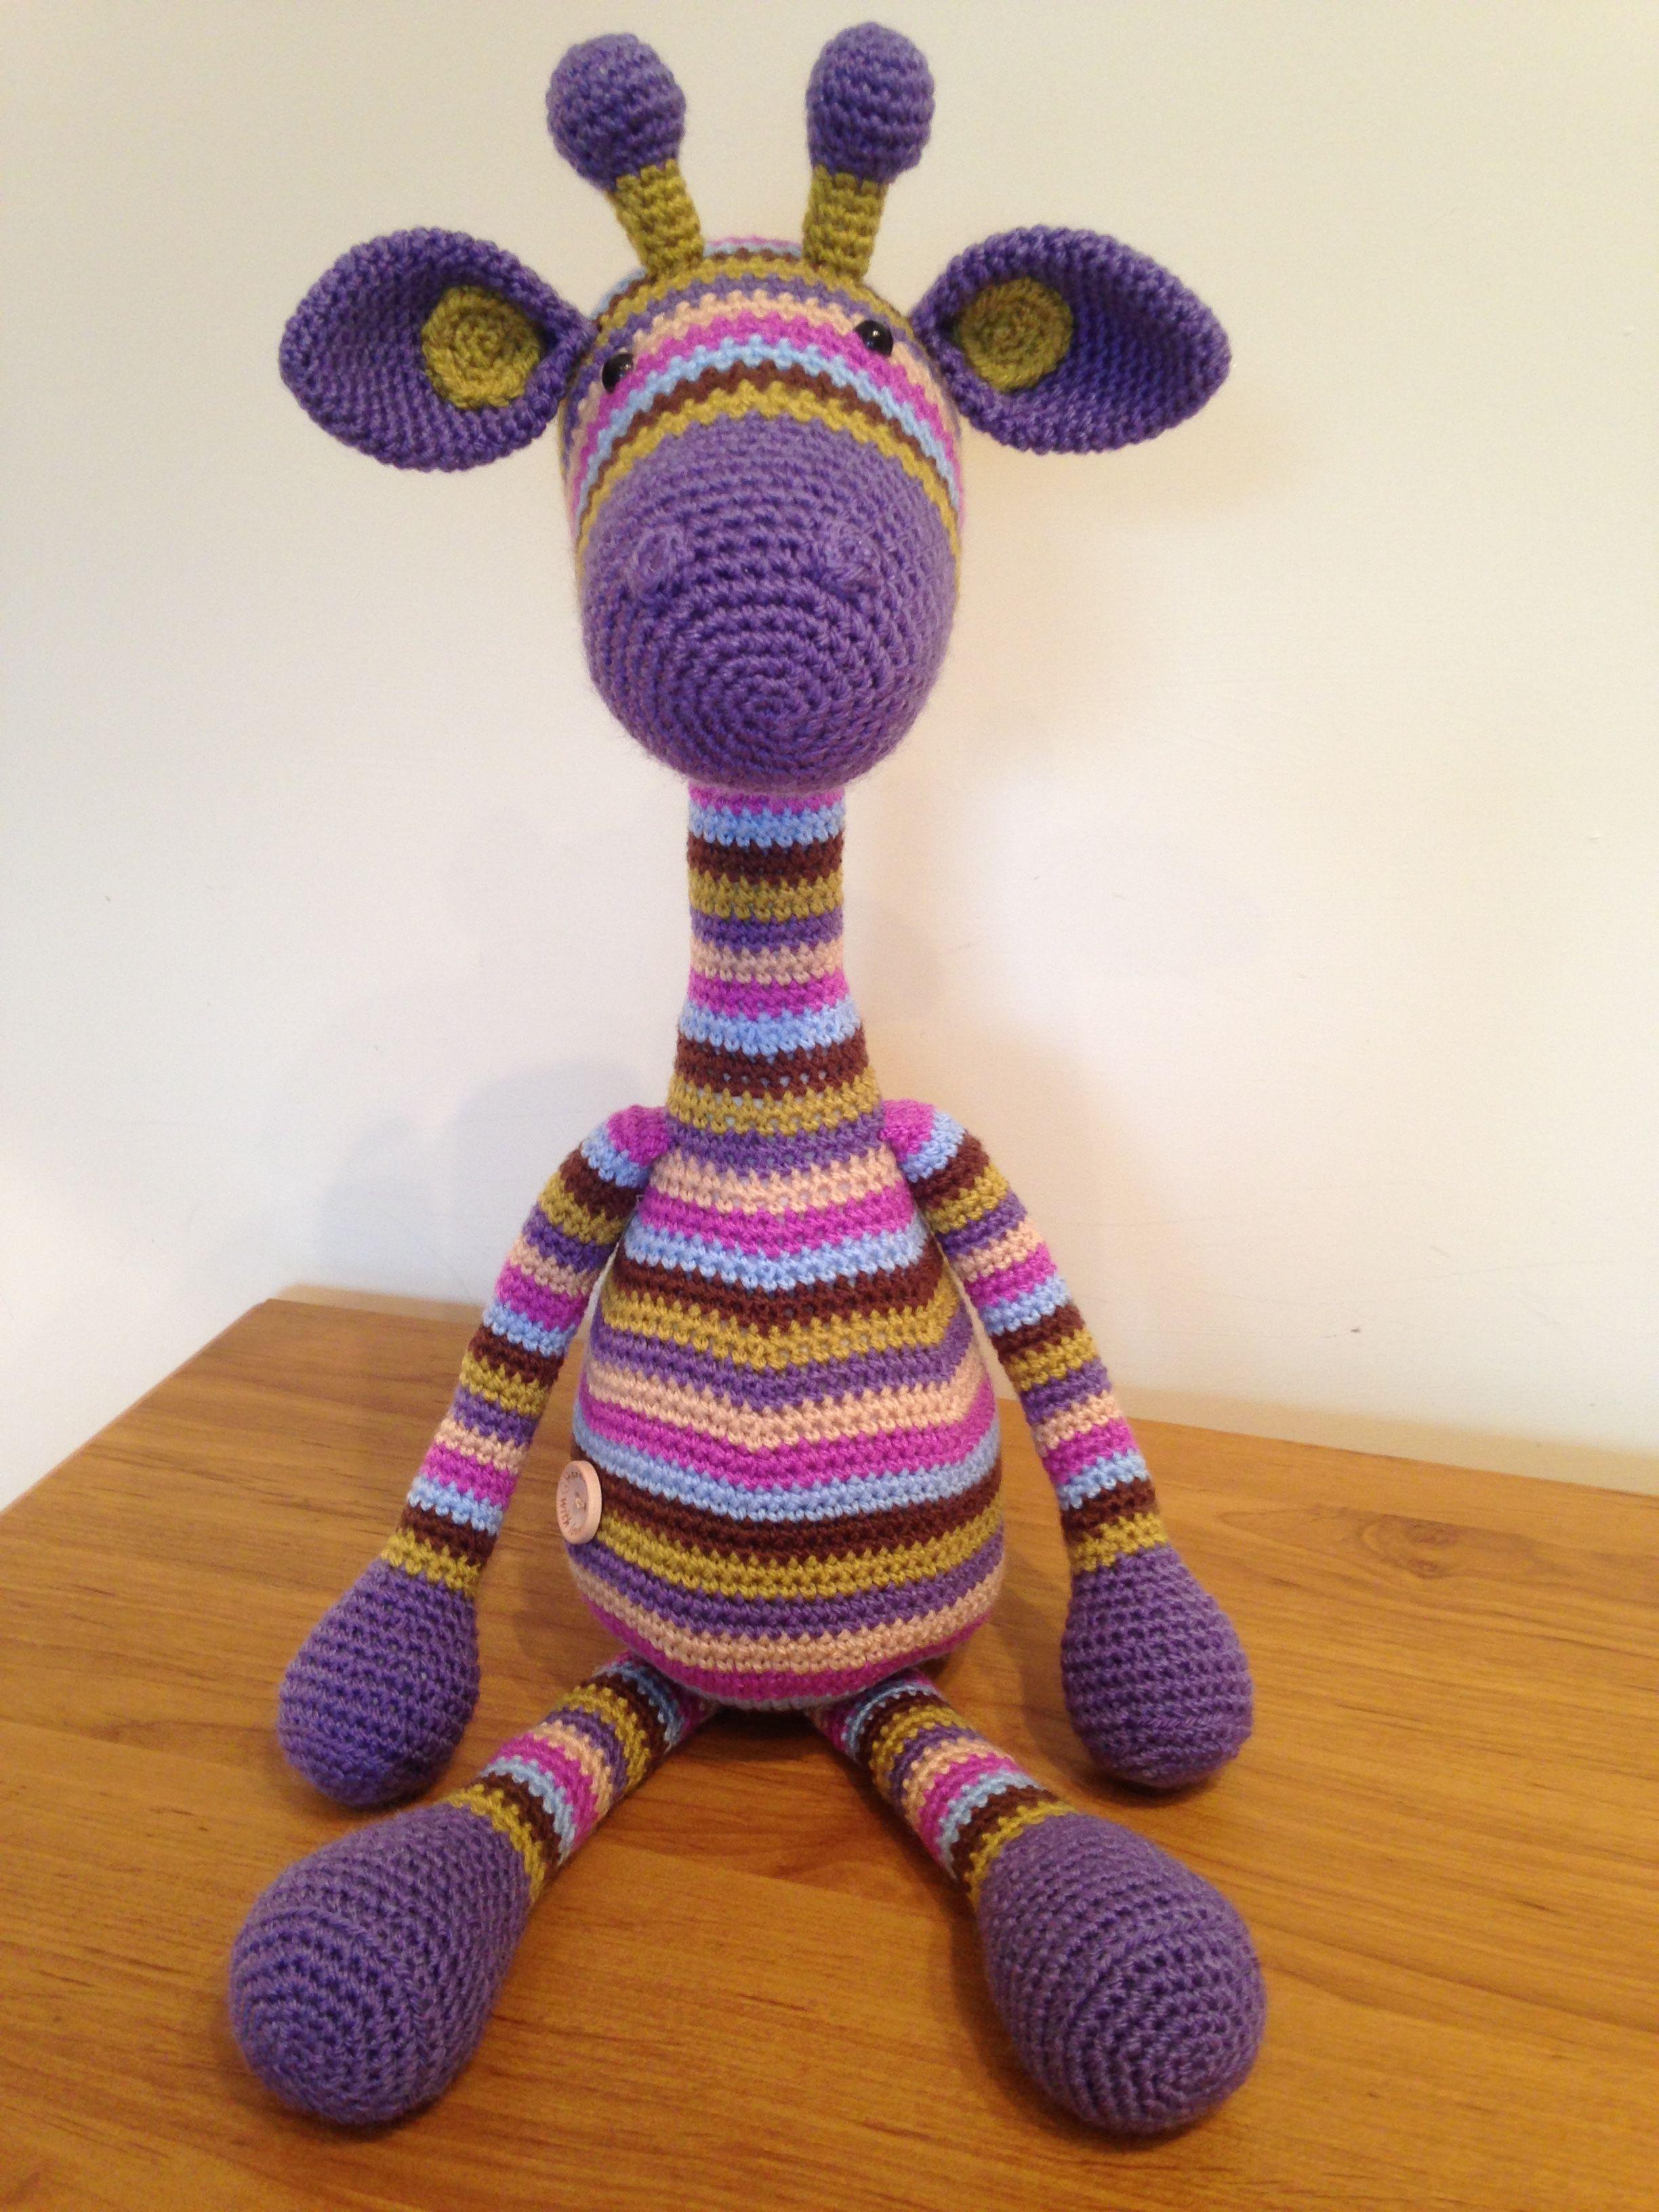 Another Amigurumi giraffe made using a Stip and Haak pattern